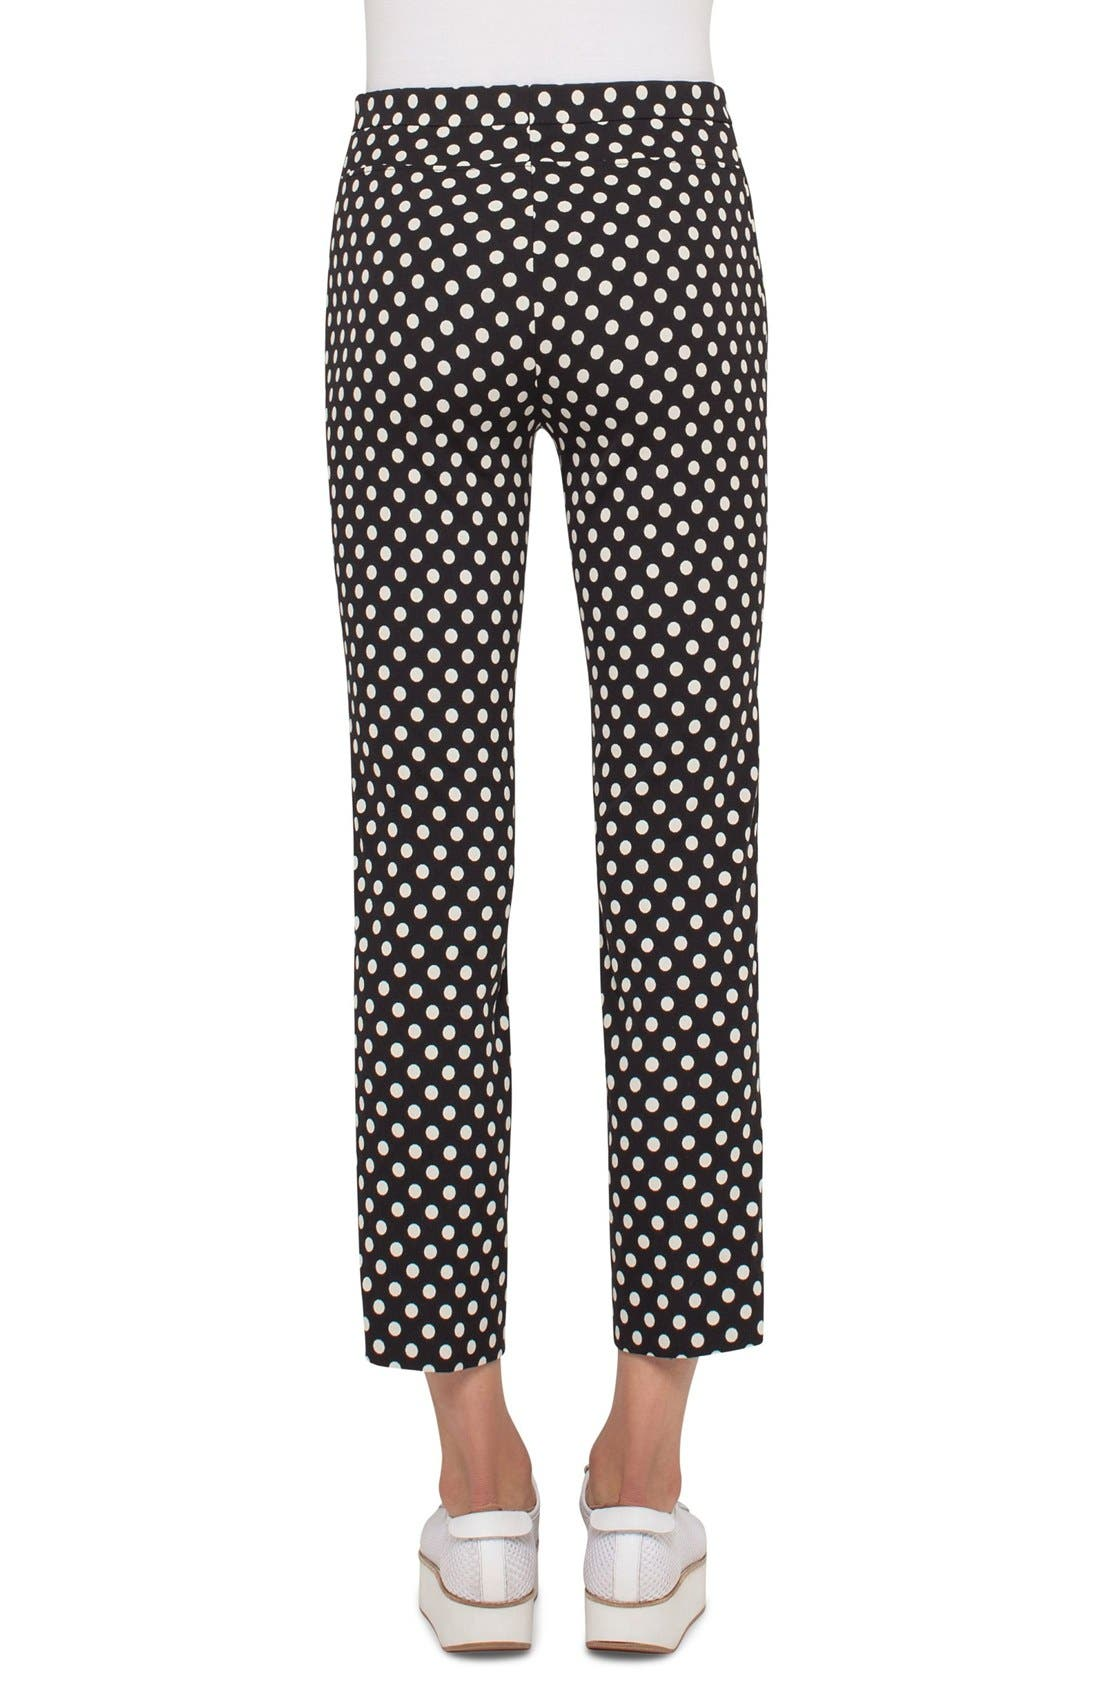 Franca Dot Print Techno Stretch Pants,                             Alternate thumbnail 2, color,                             Dot Print Black